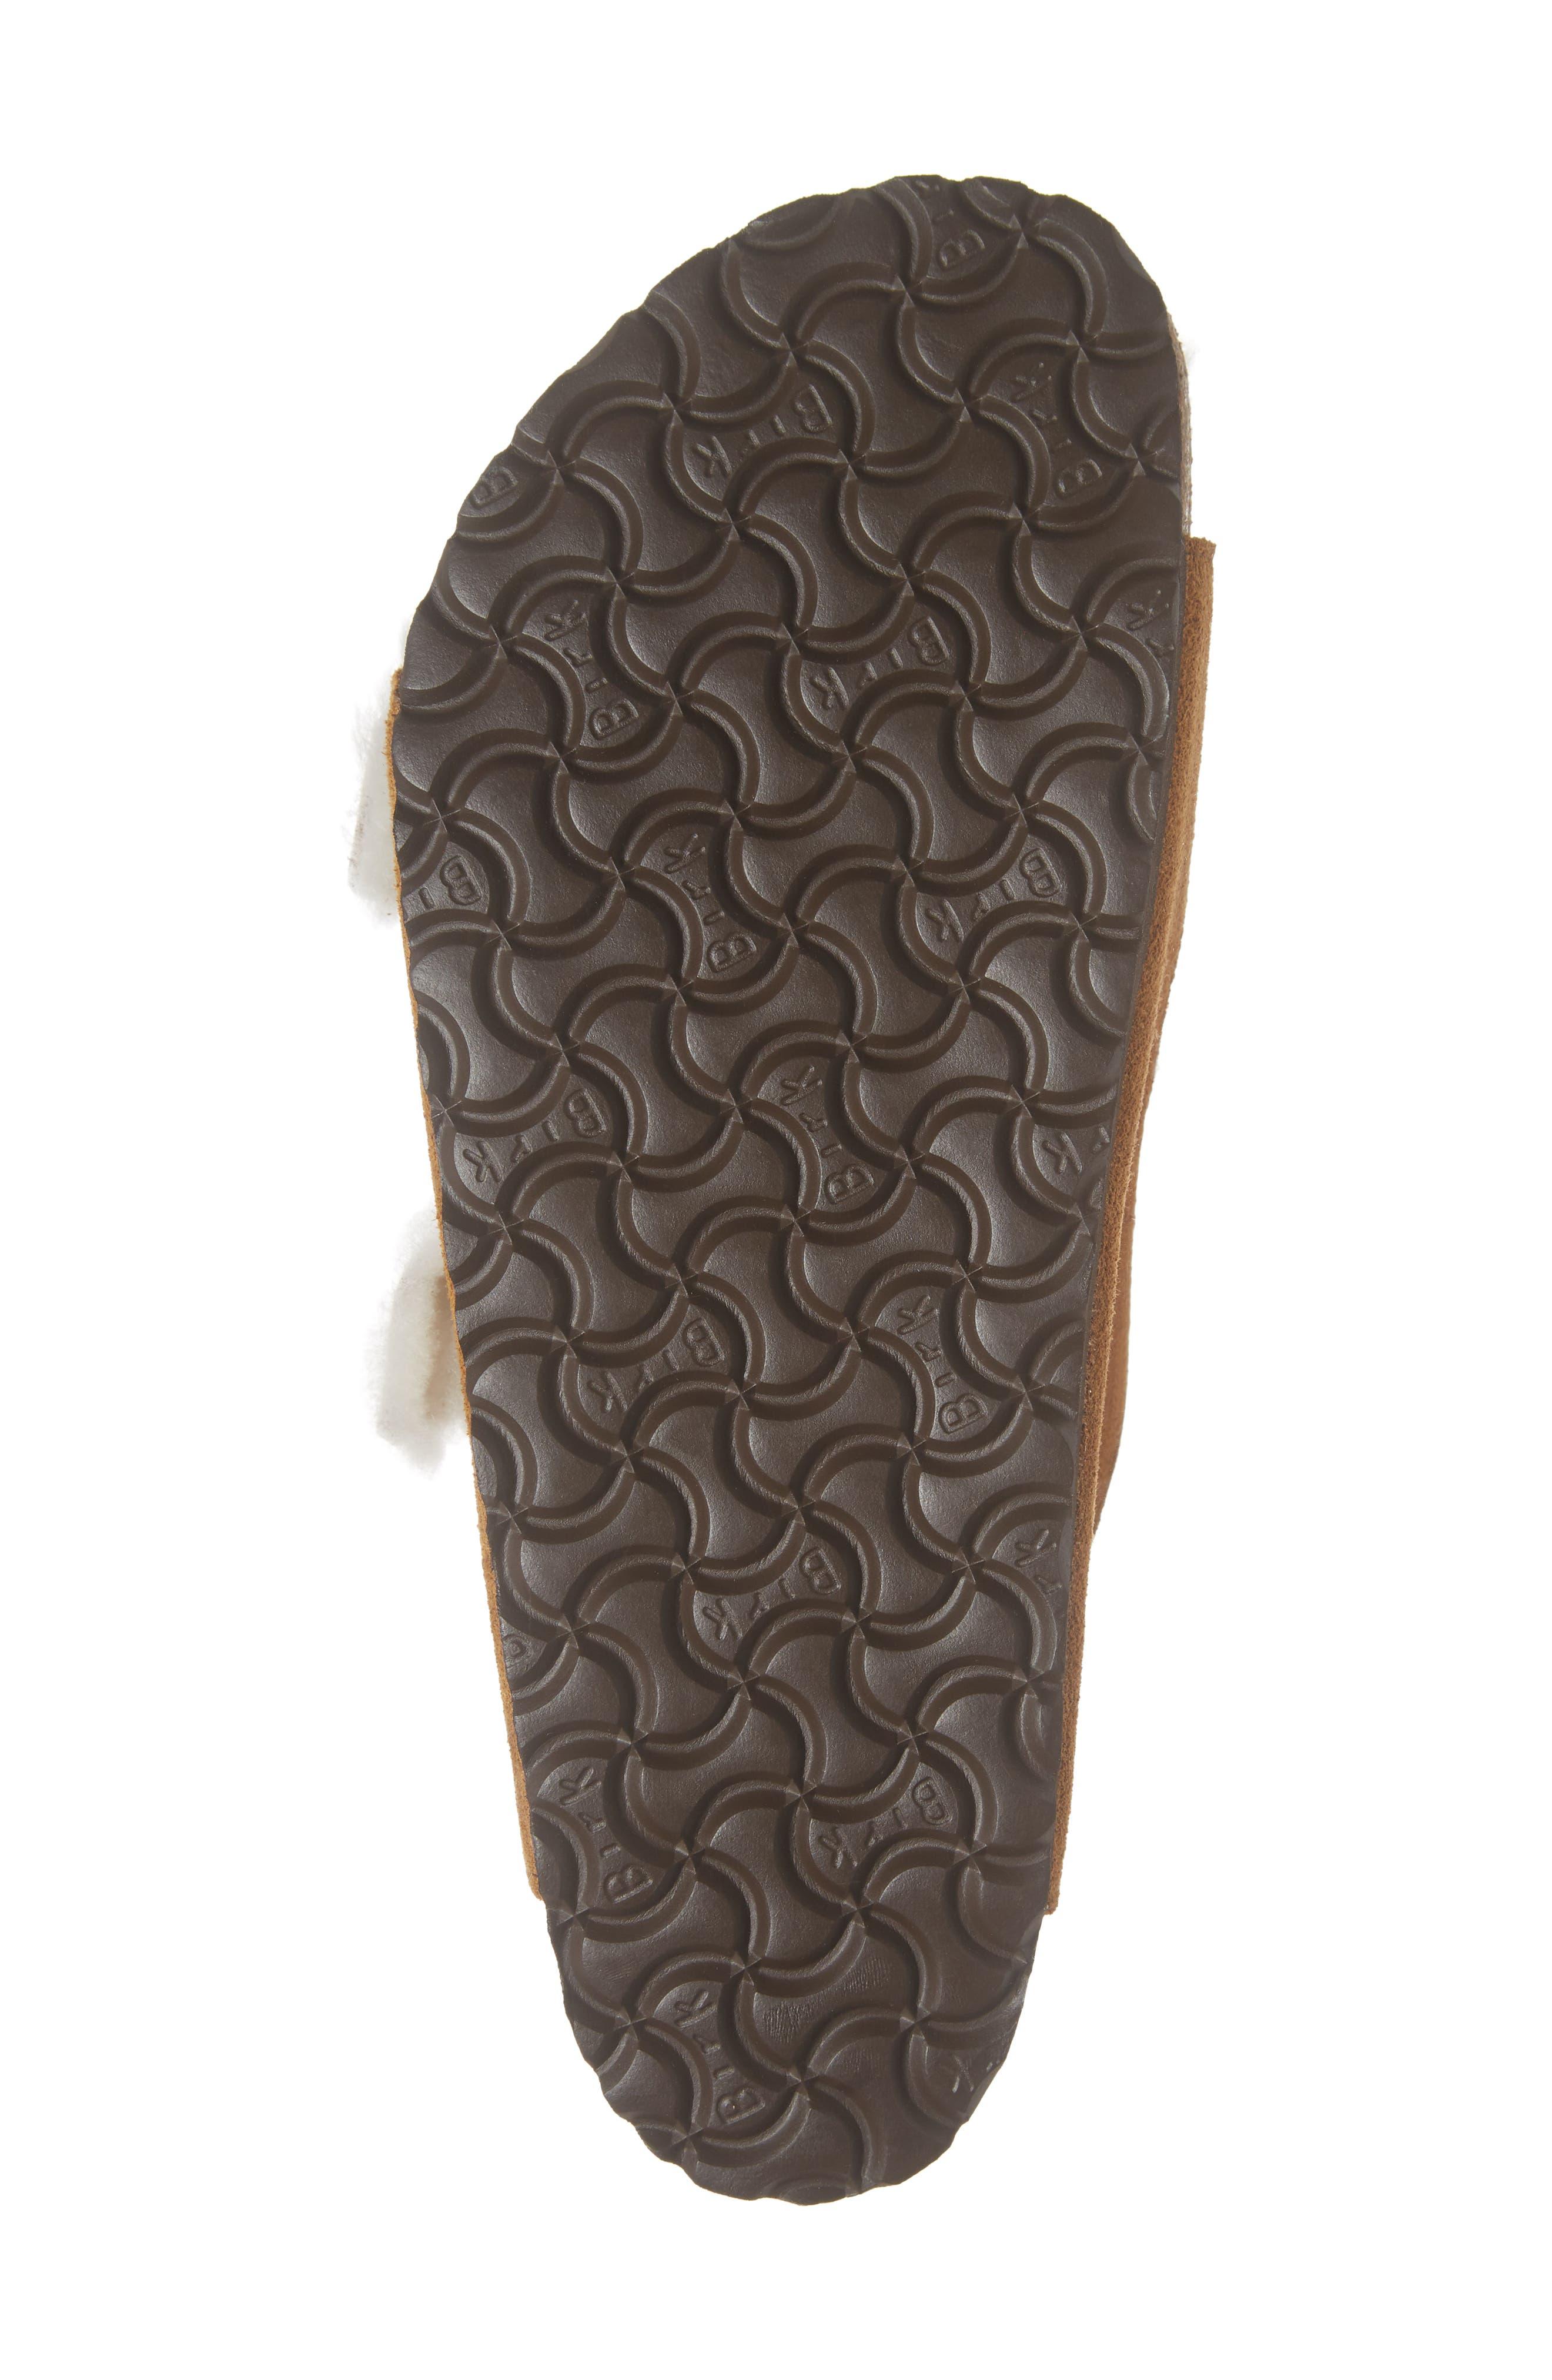 Arizona Slide Sandal with Genuine Shearling,                             Alternate thumbnail 6, color,                             BEIGE